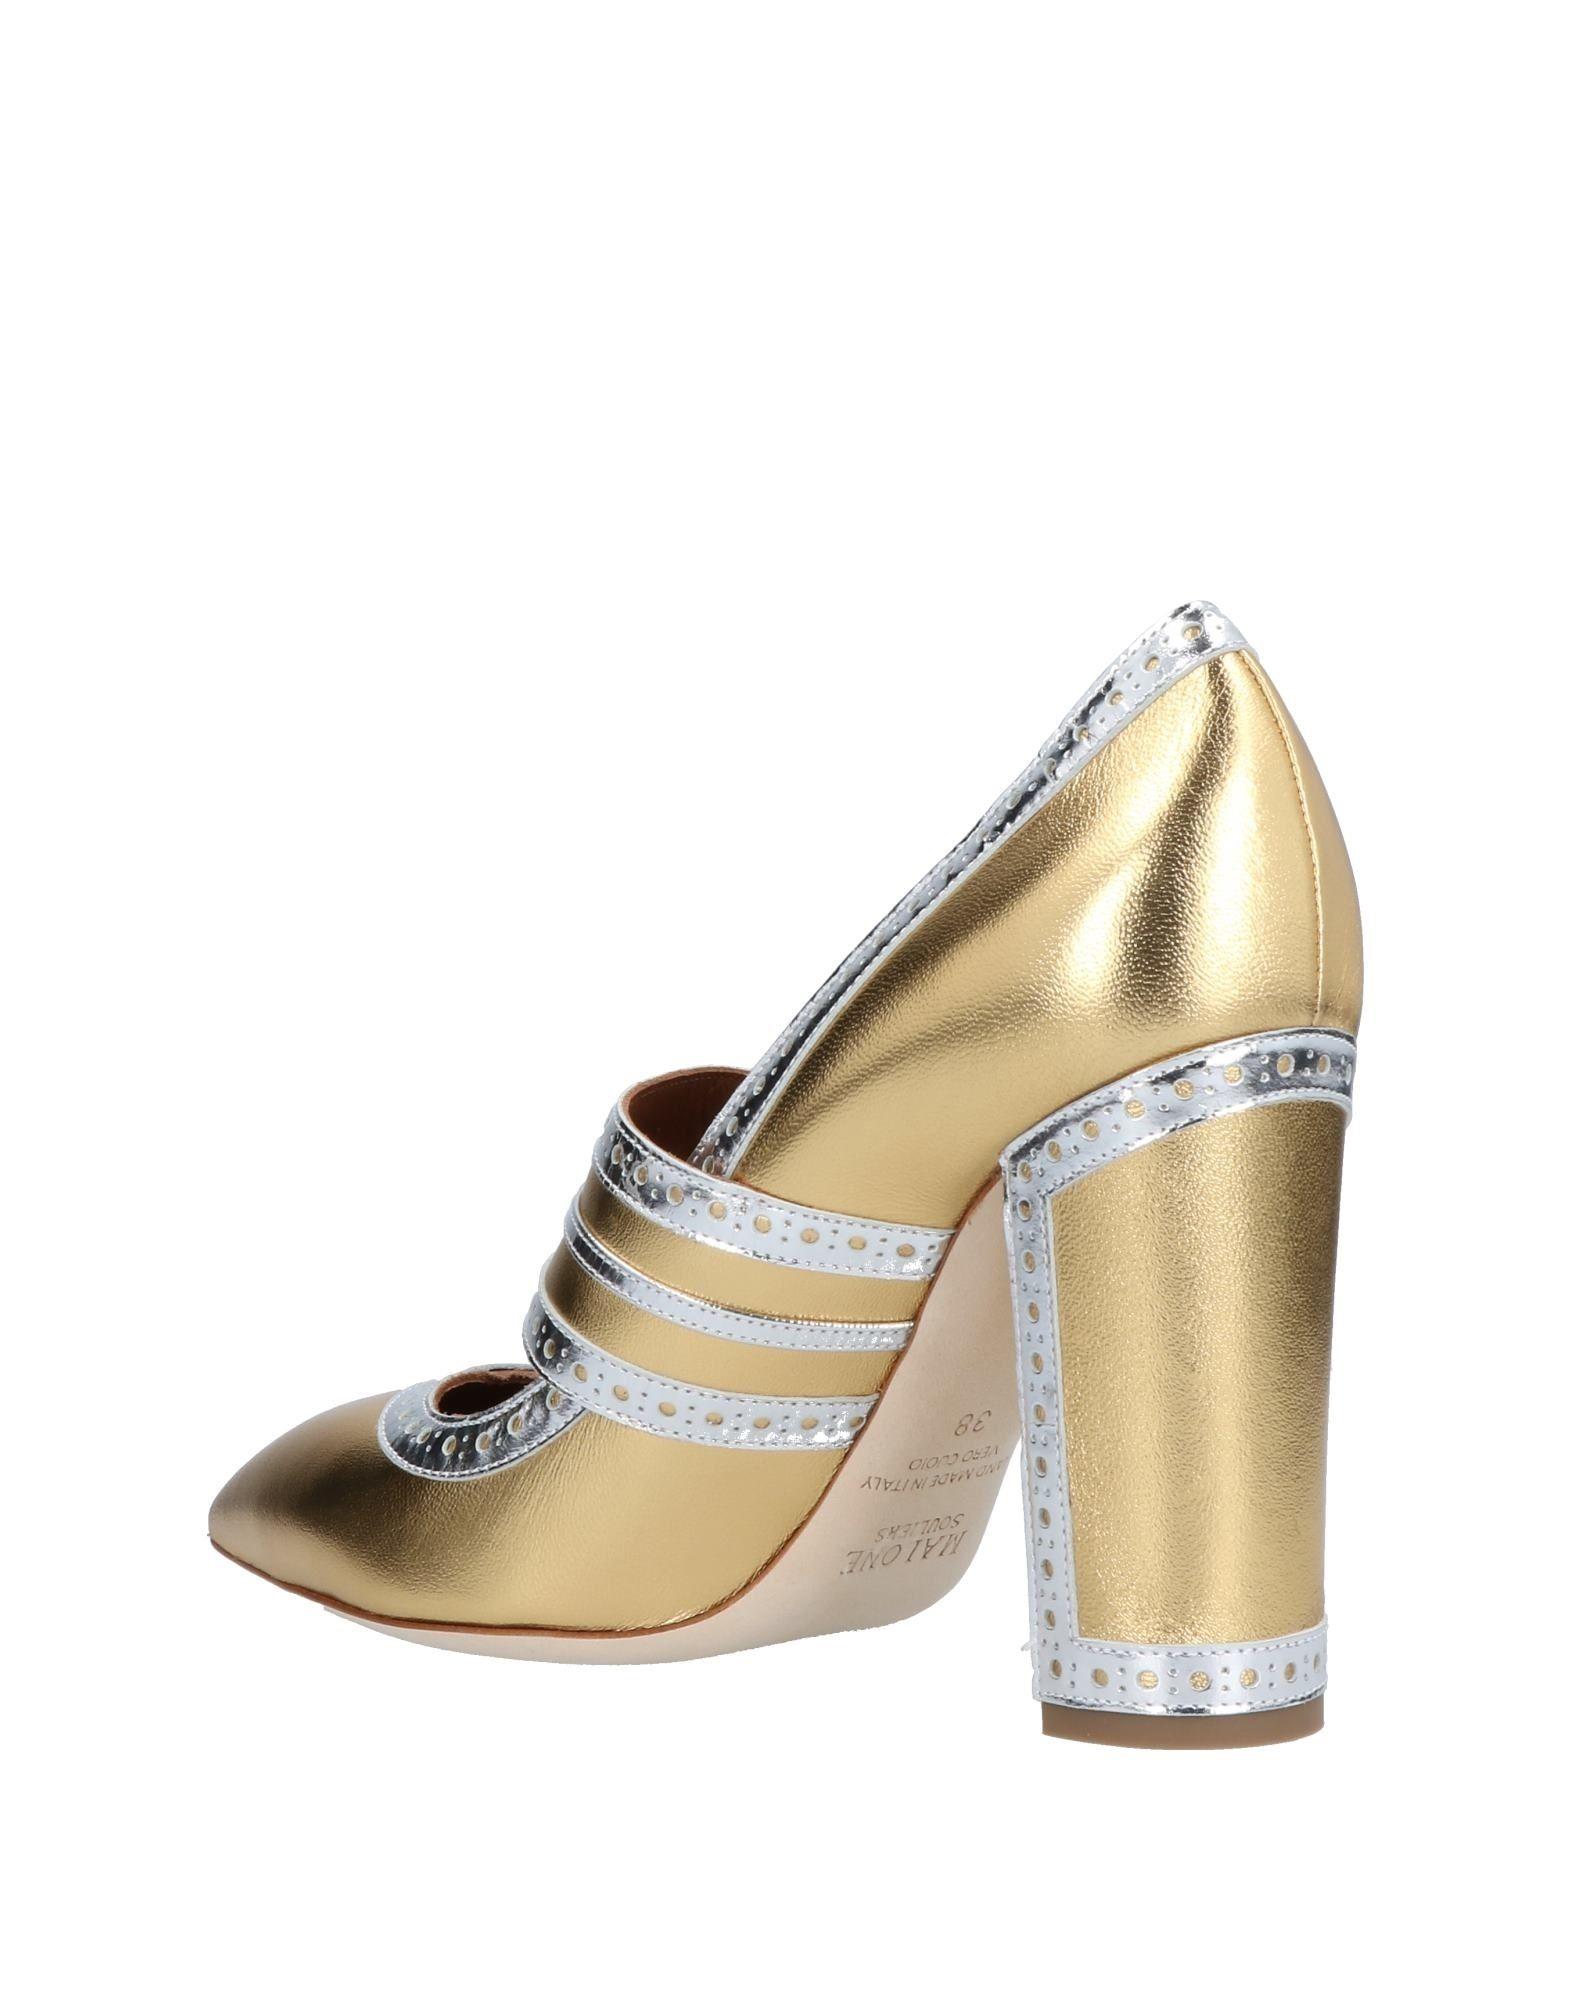 Rabatt Souliers Schuhe Malone Souliers Rabatt Pumps Damen  11472755RC 391d7c